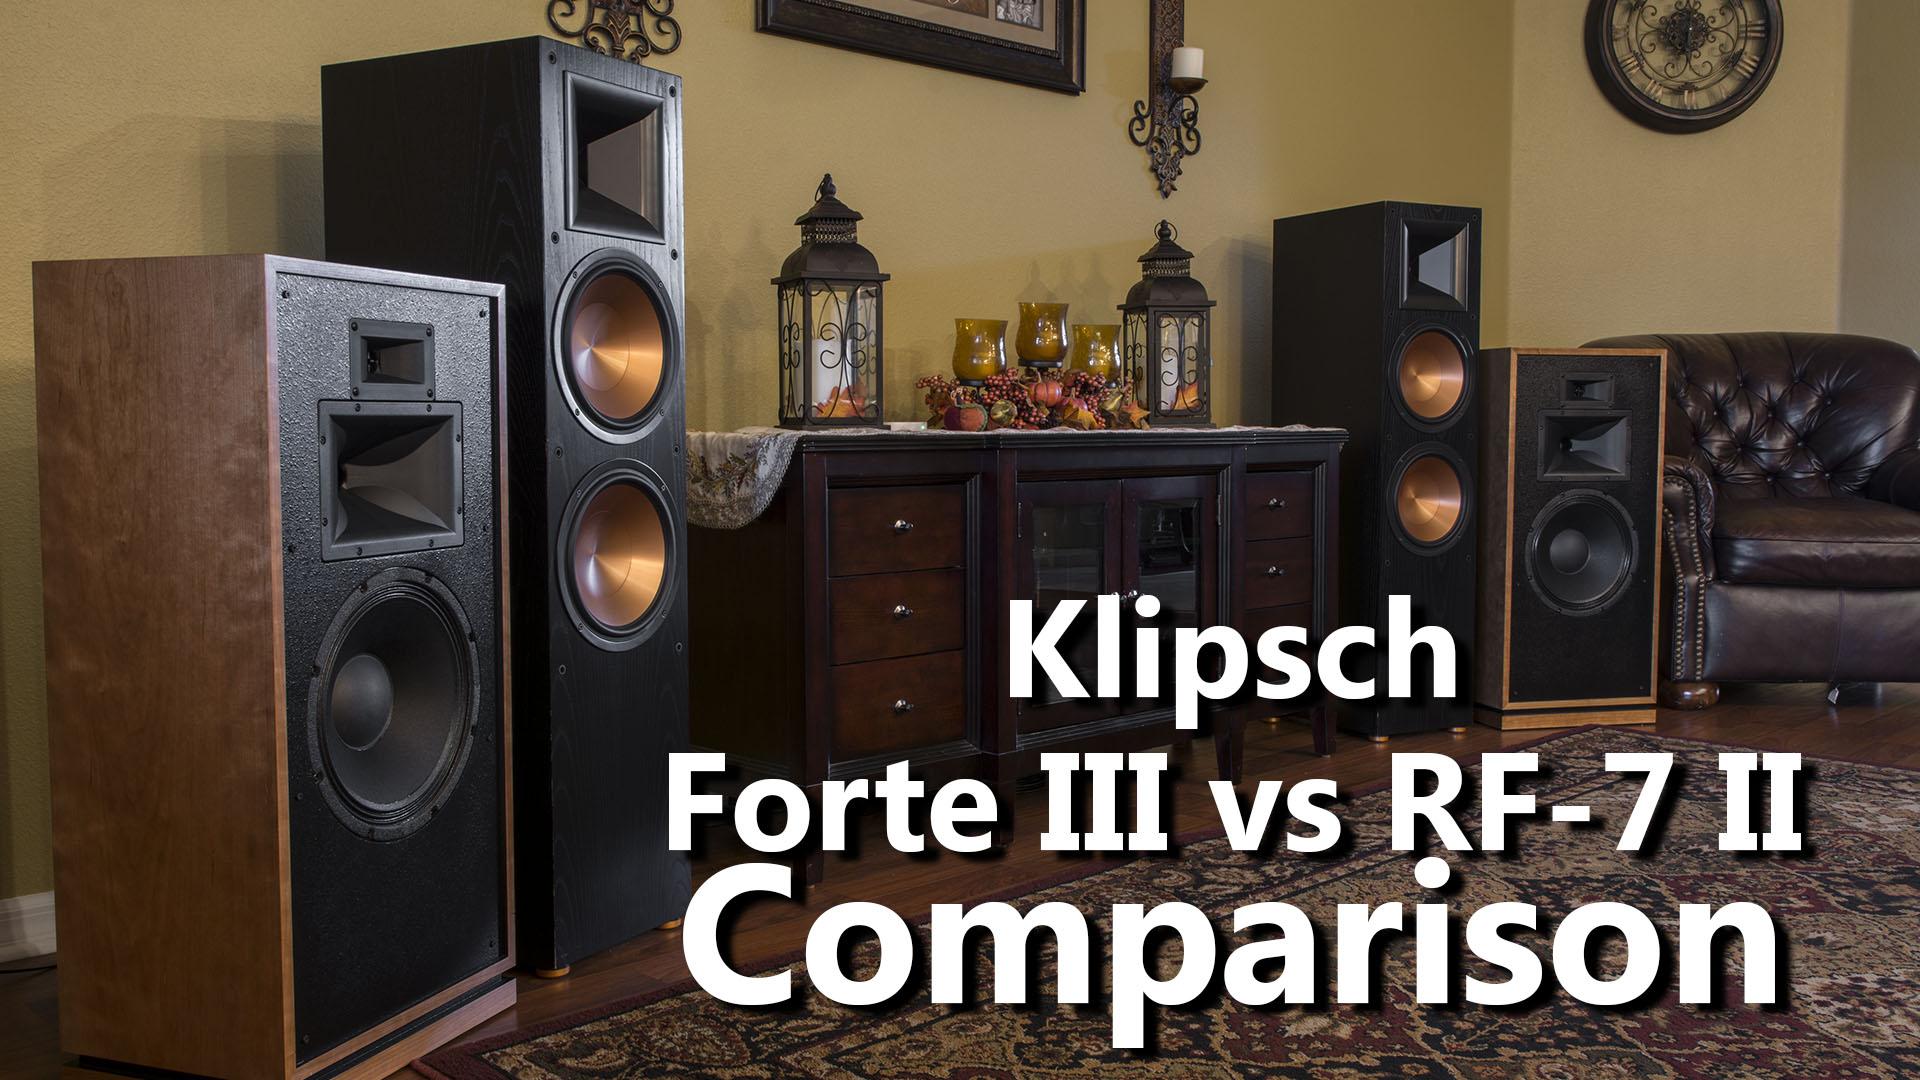 Klipsch Forte III vs RF-7 II Audio Demo Comparison - 2